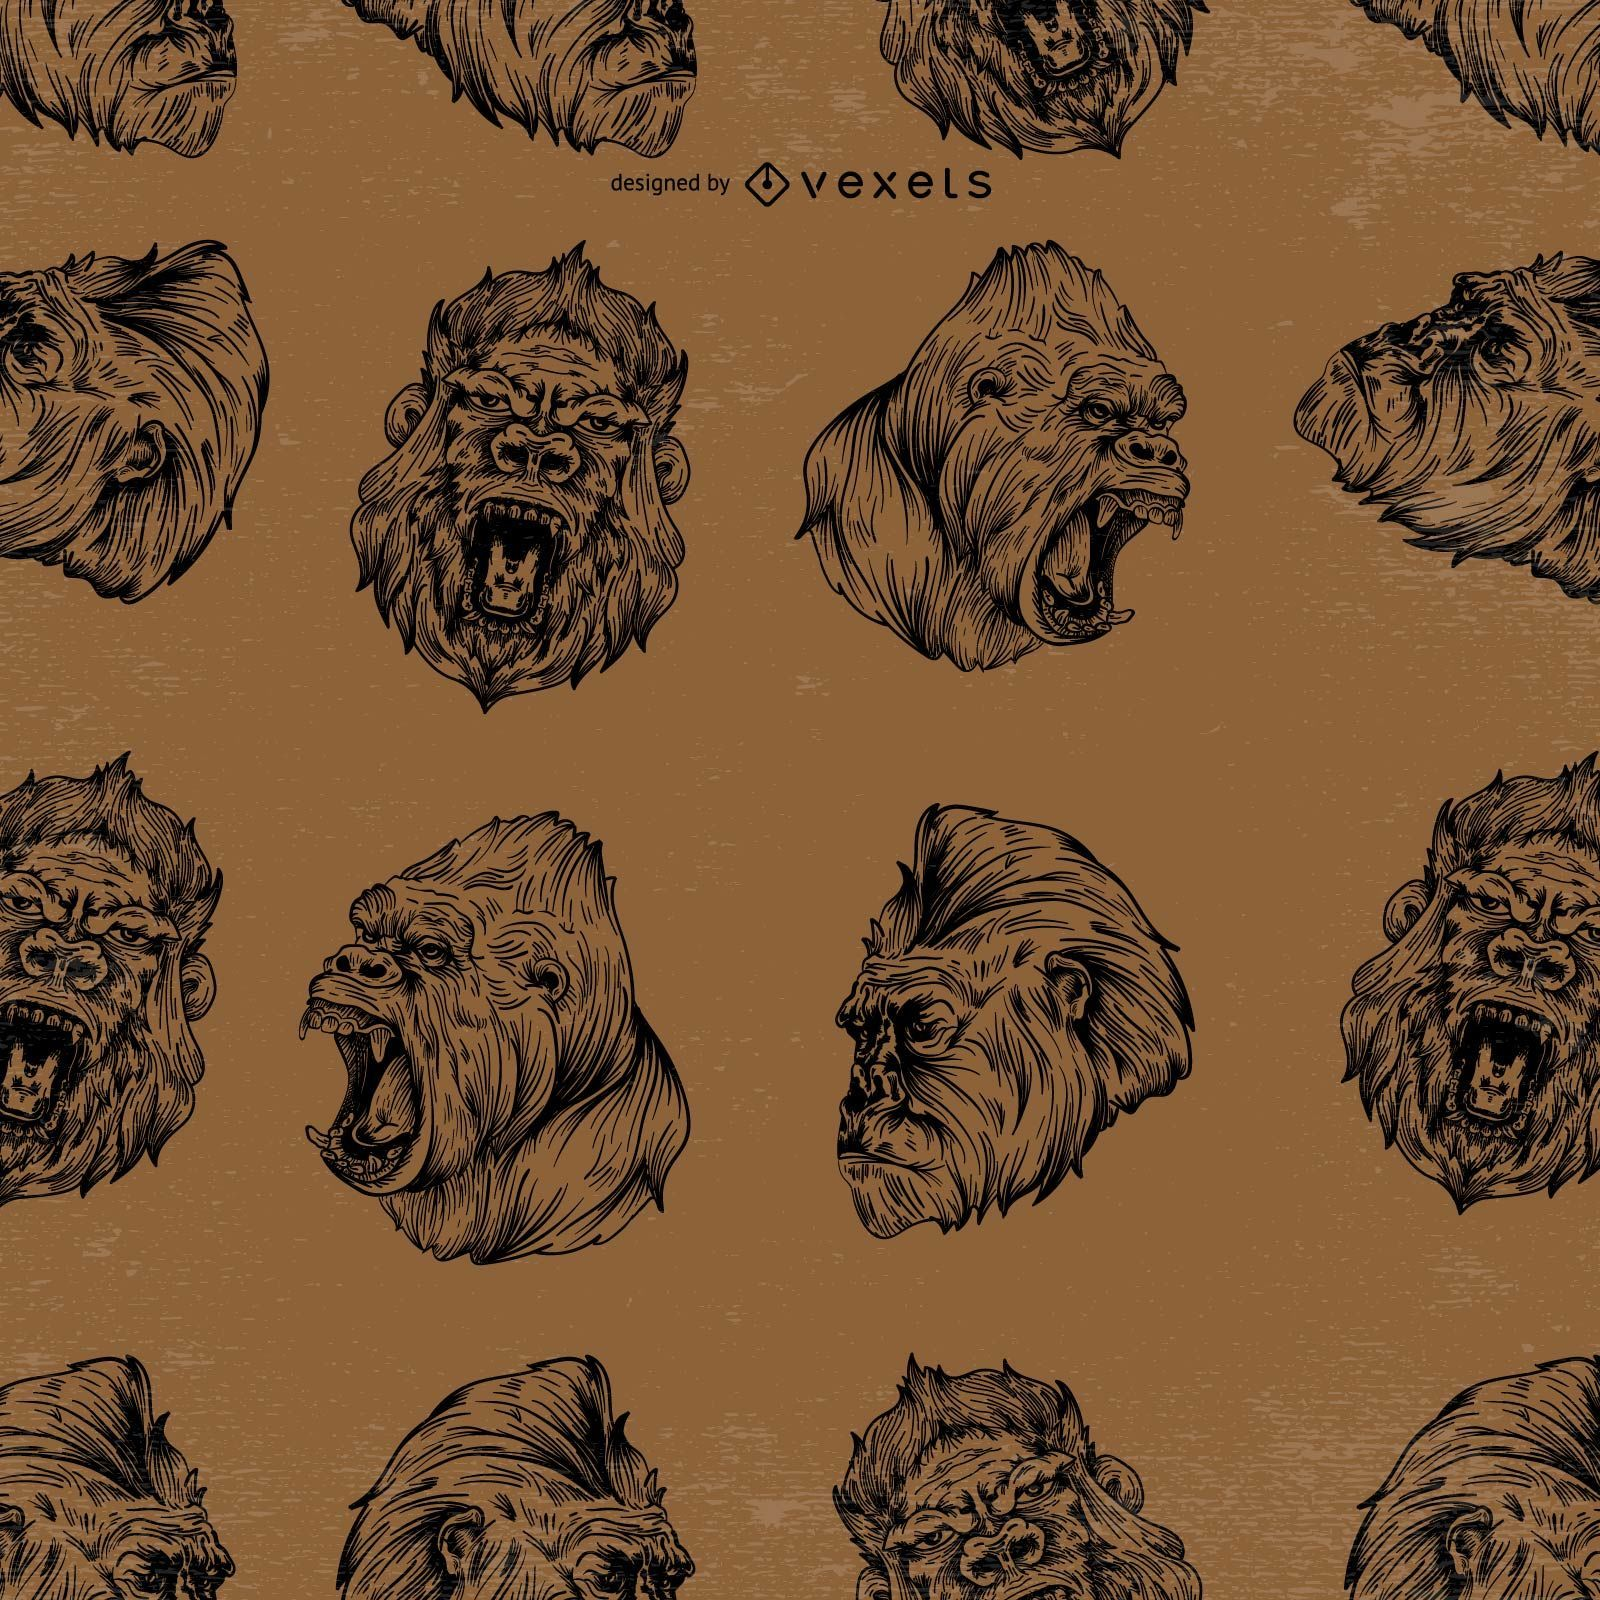 Seamless gorilla pattern design